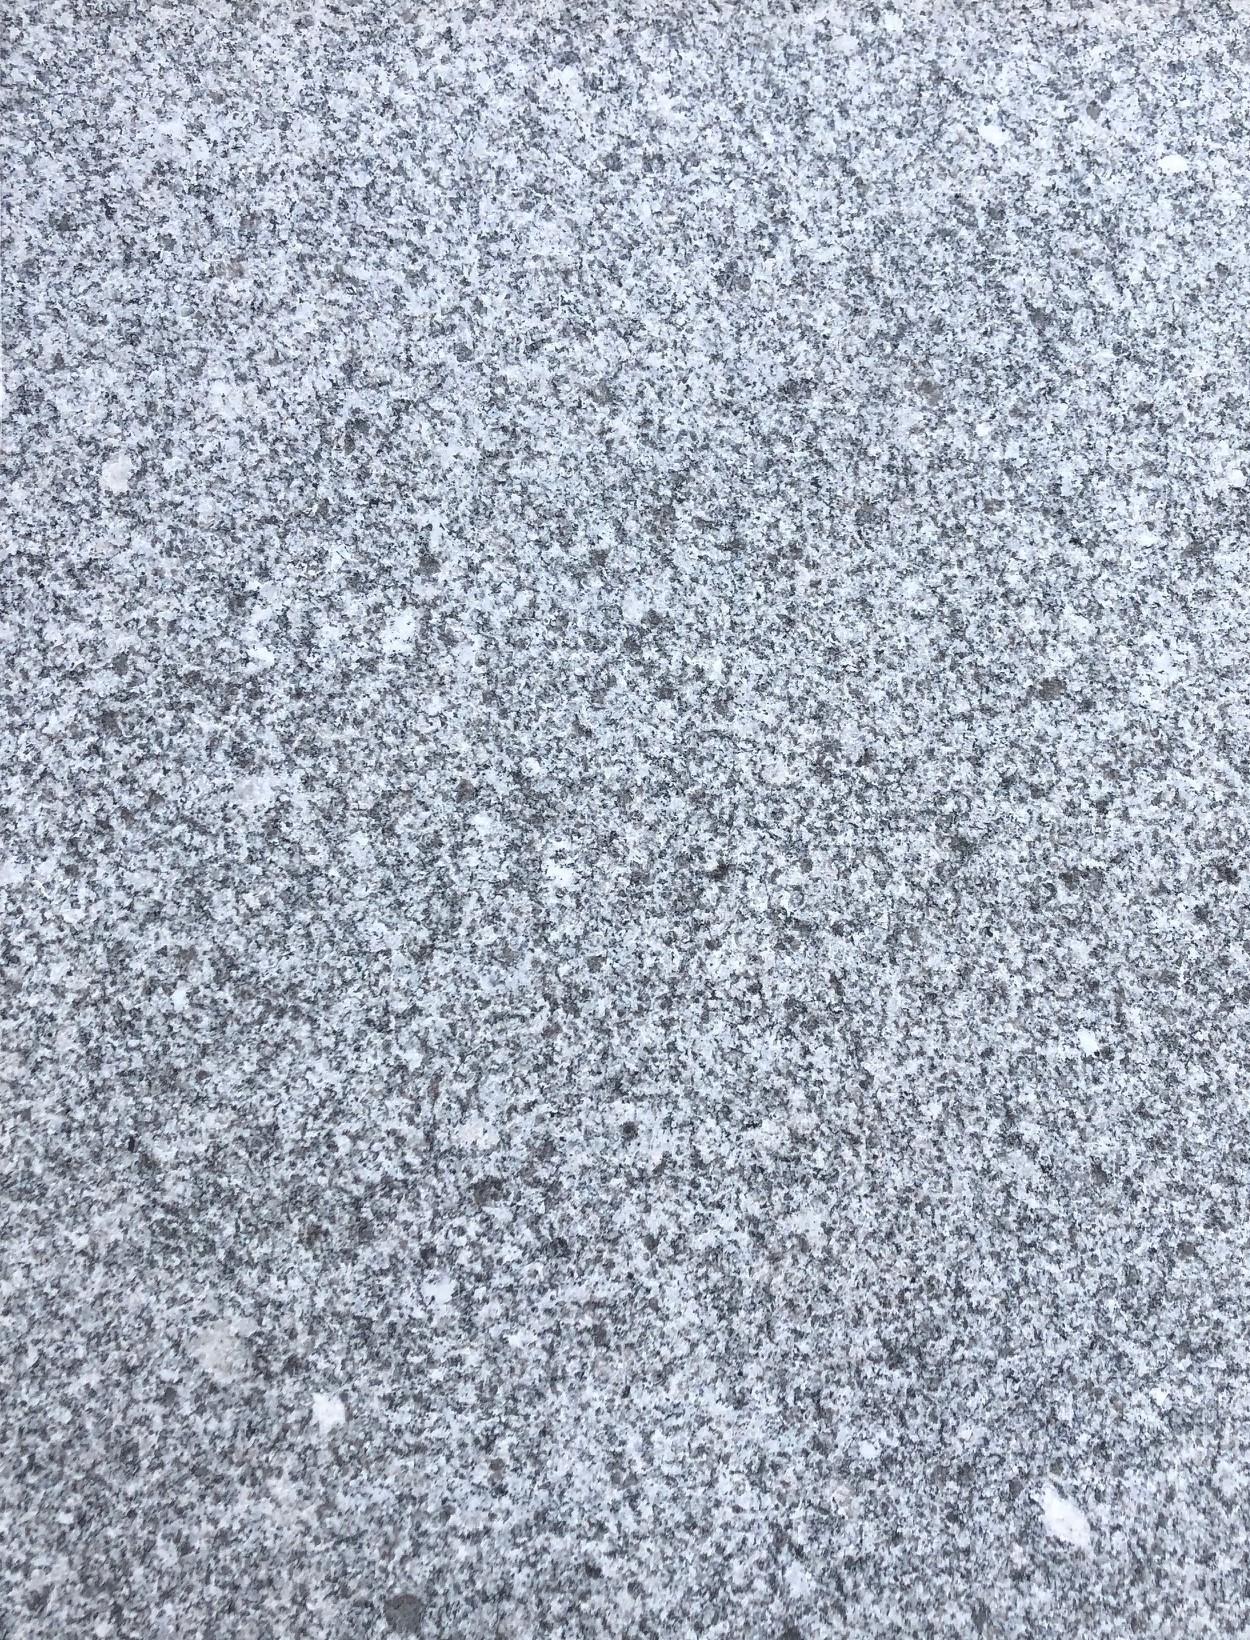 Snow Granite